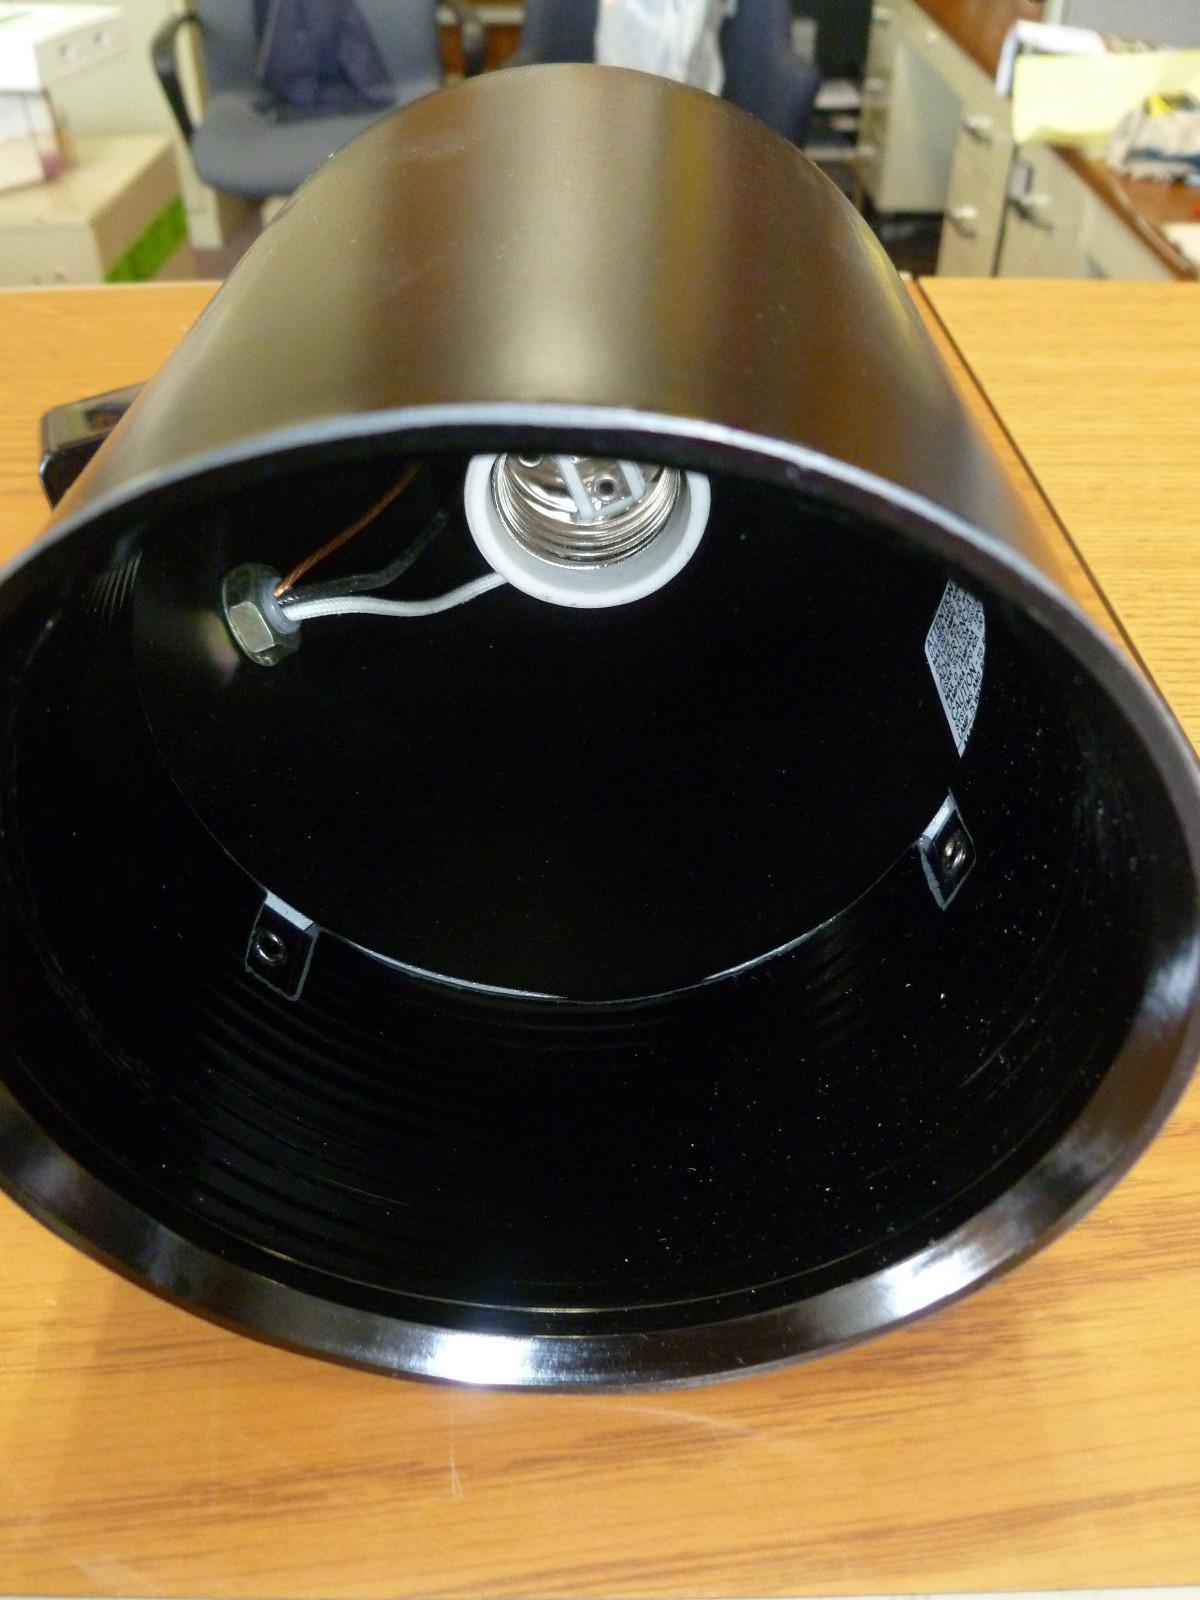 HALO POWER-TRAC L-746-MBX BLACK LIGHT FIXTURE LAMPHOLDER HANGING CEILING